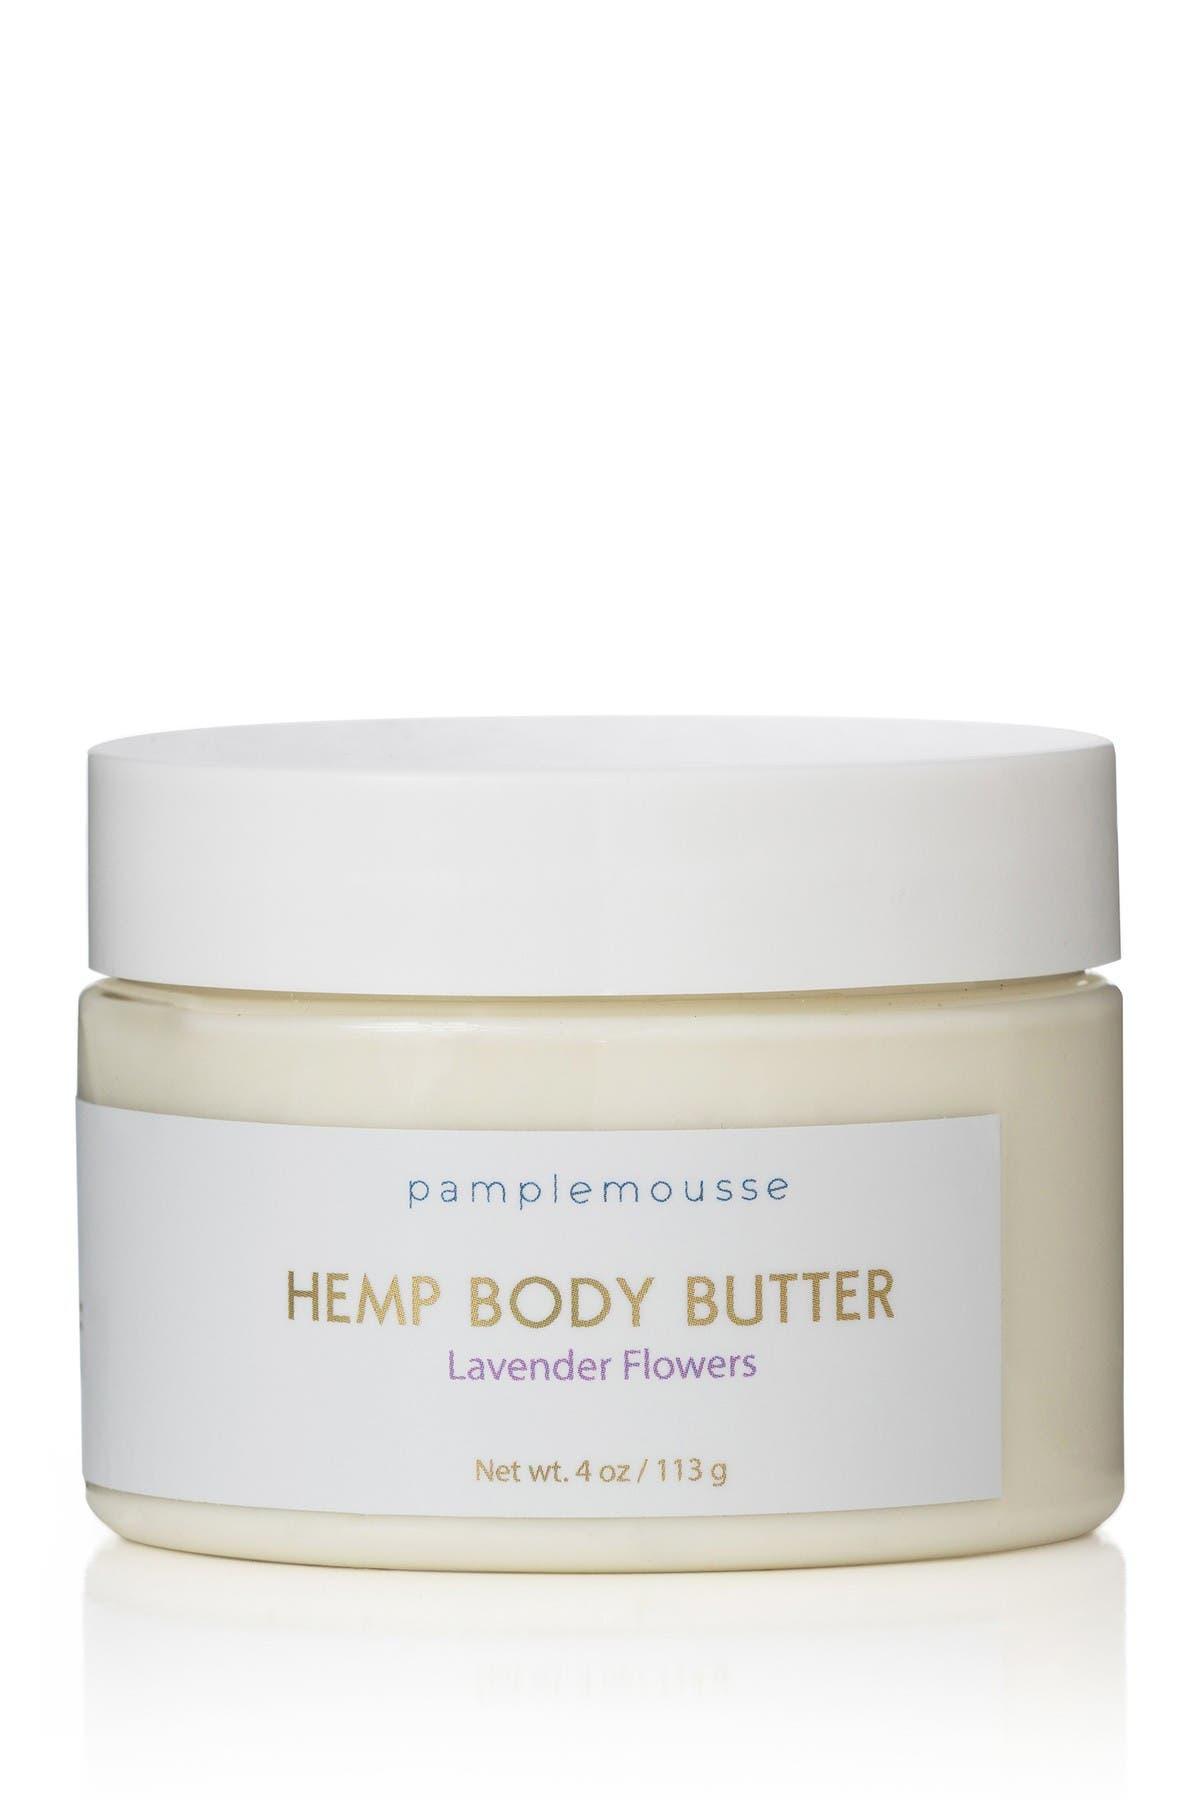 Image of Pamplemousse Hemp Body Butter - Lavender Flowers - 4 oz.